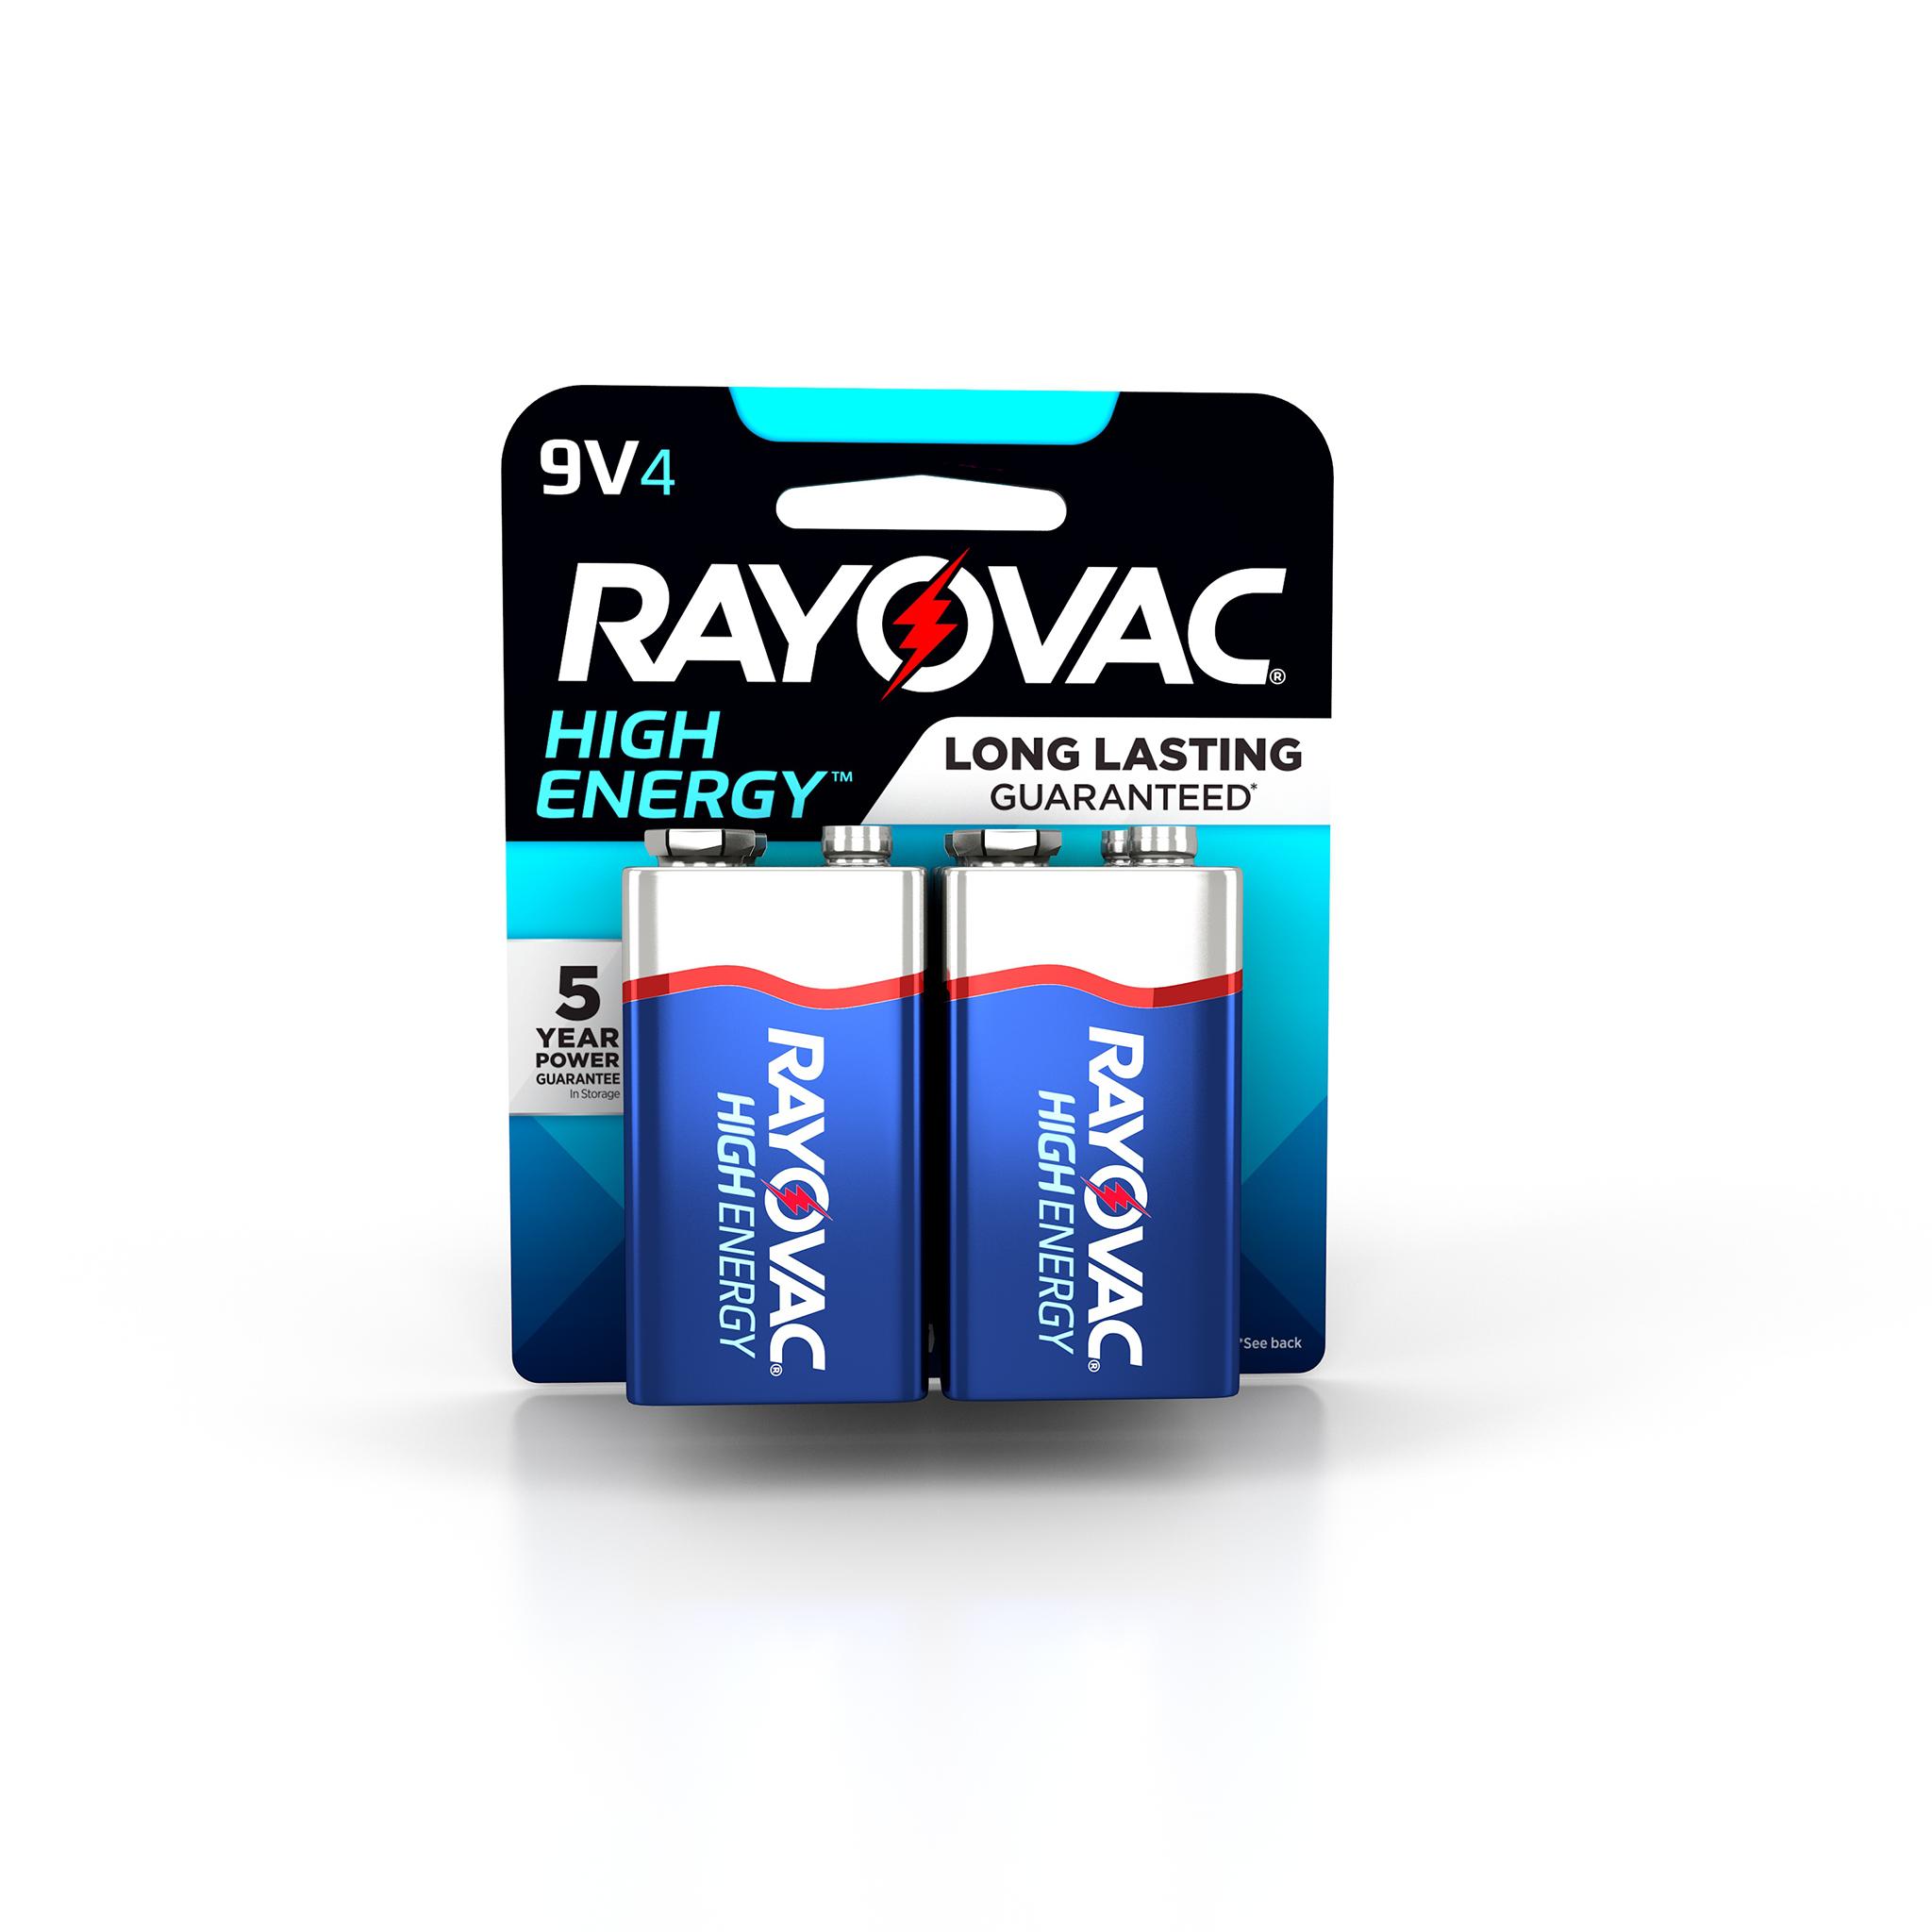 Rayovac High Energy Alkaline, 9V Batteries, 4-Pack